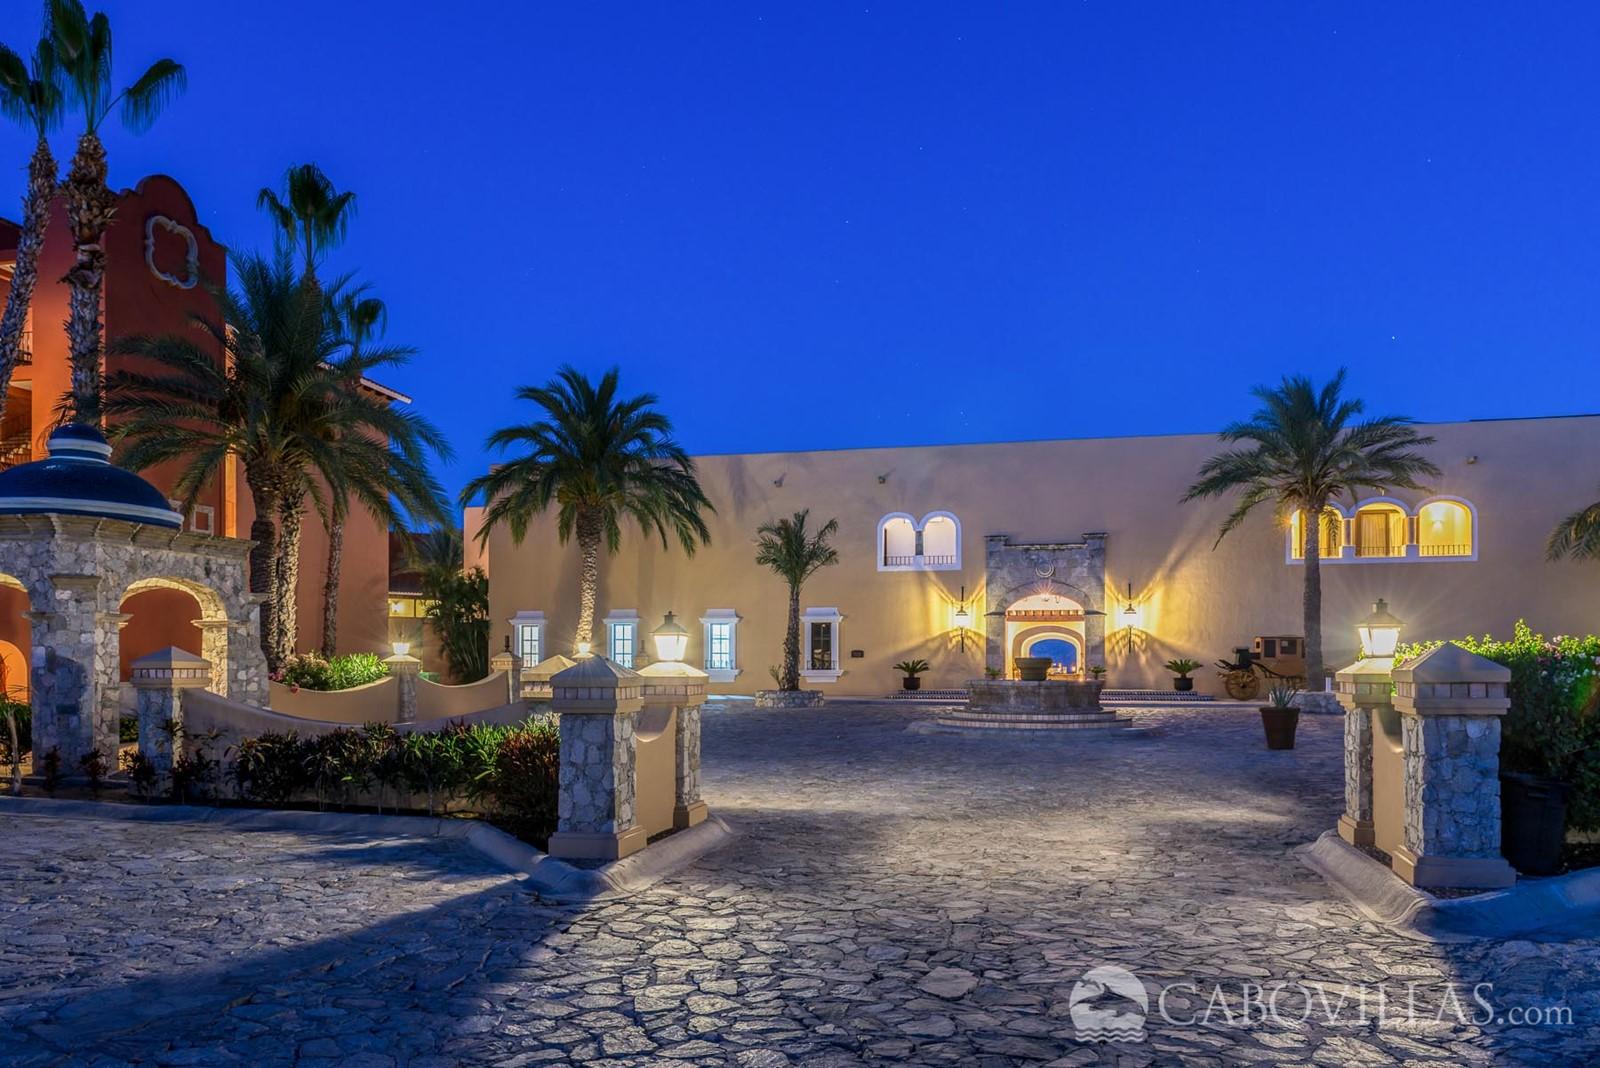 Casa del Mar Golf Resort and Spa - Cabo San Lucas, Mexico ...